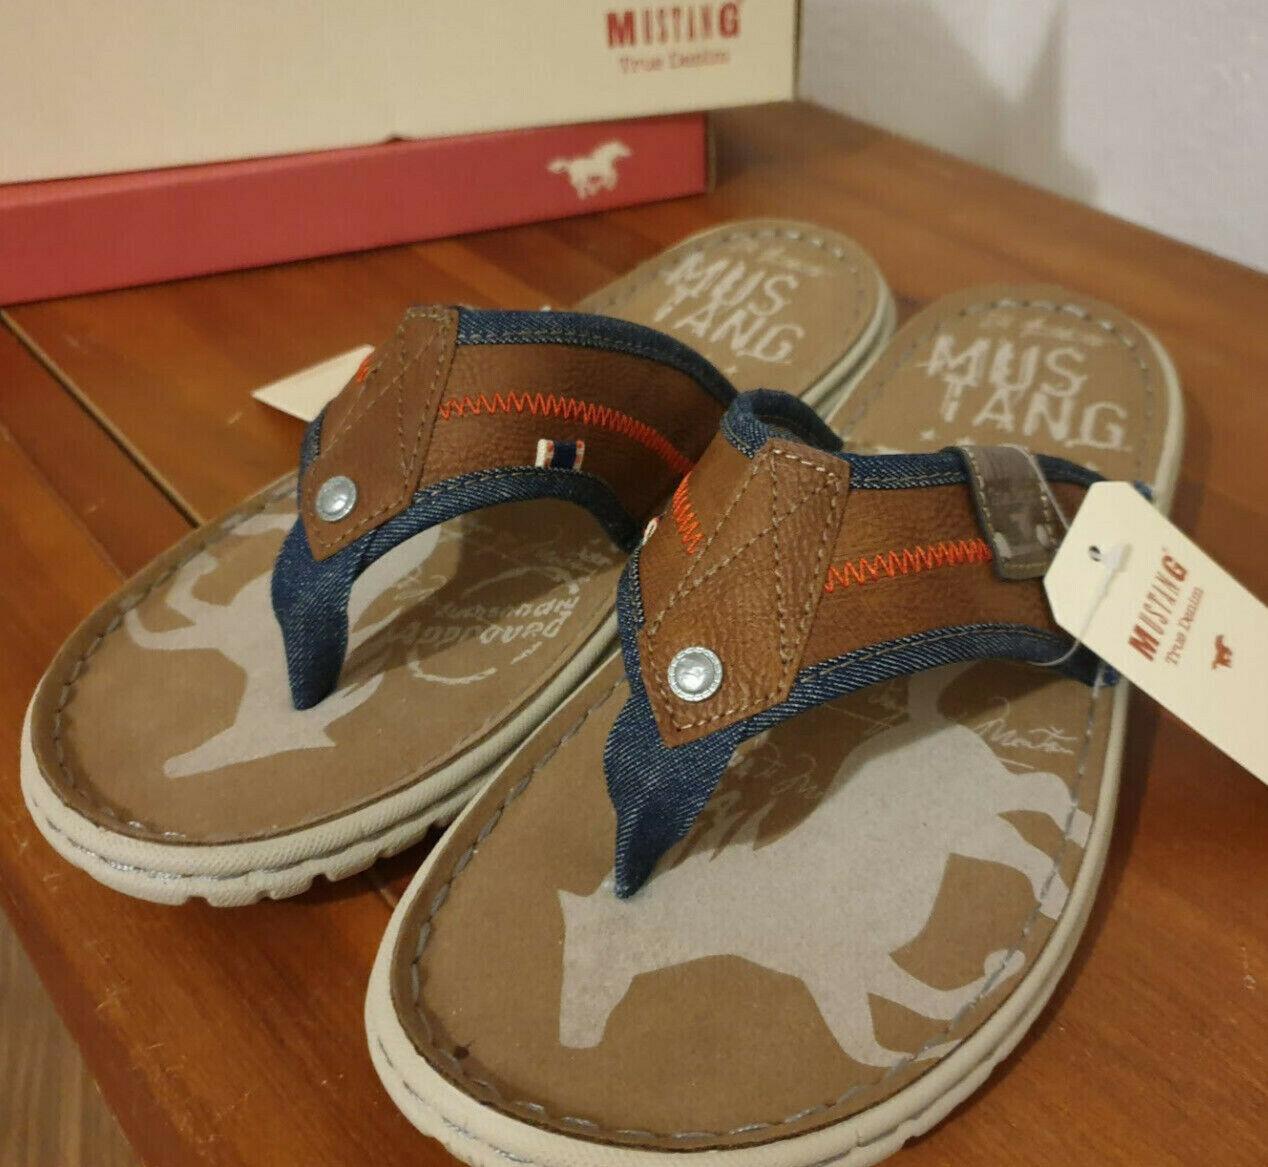 NEW Mustang Men's Shoes Size 41 EU, Mules Brown Cognac.